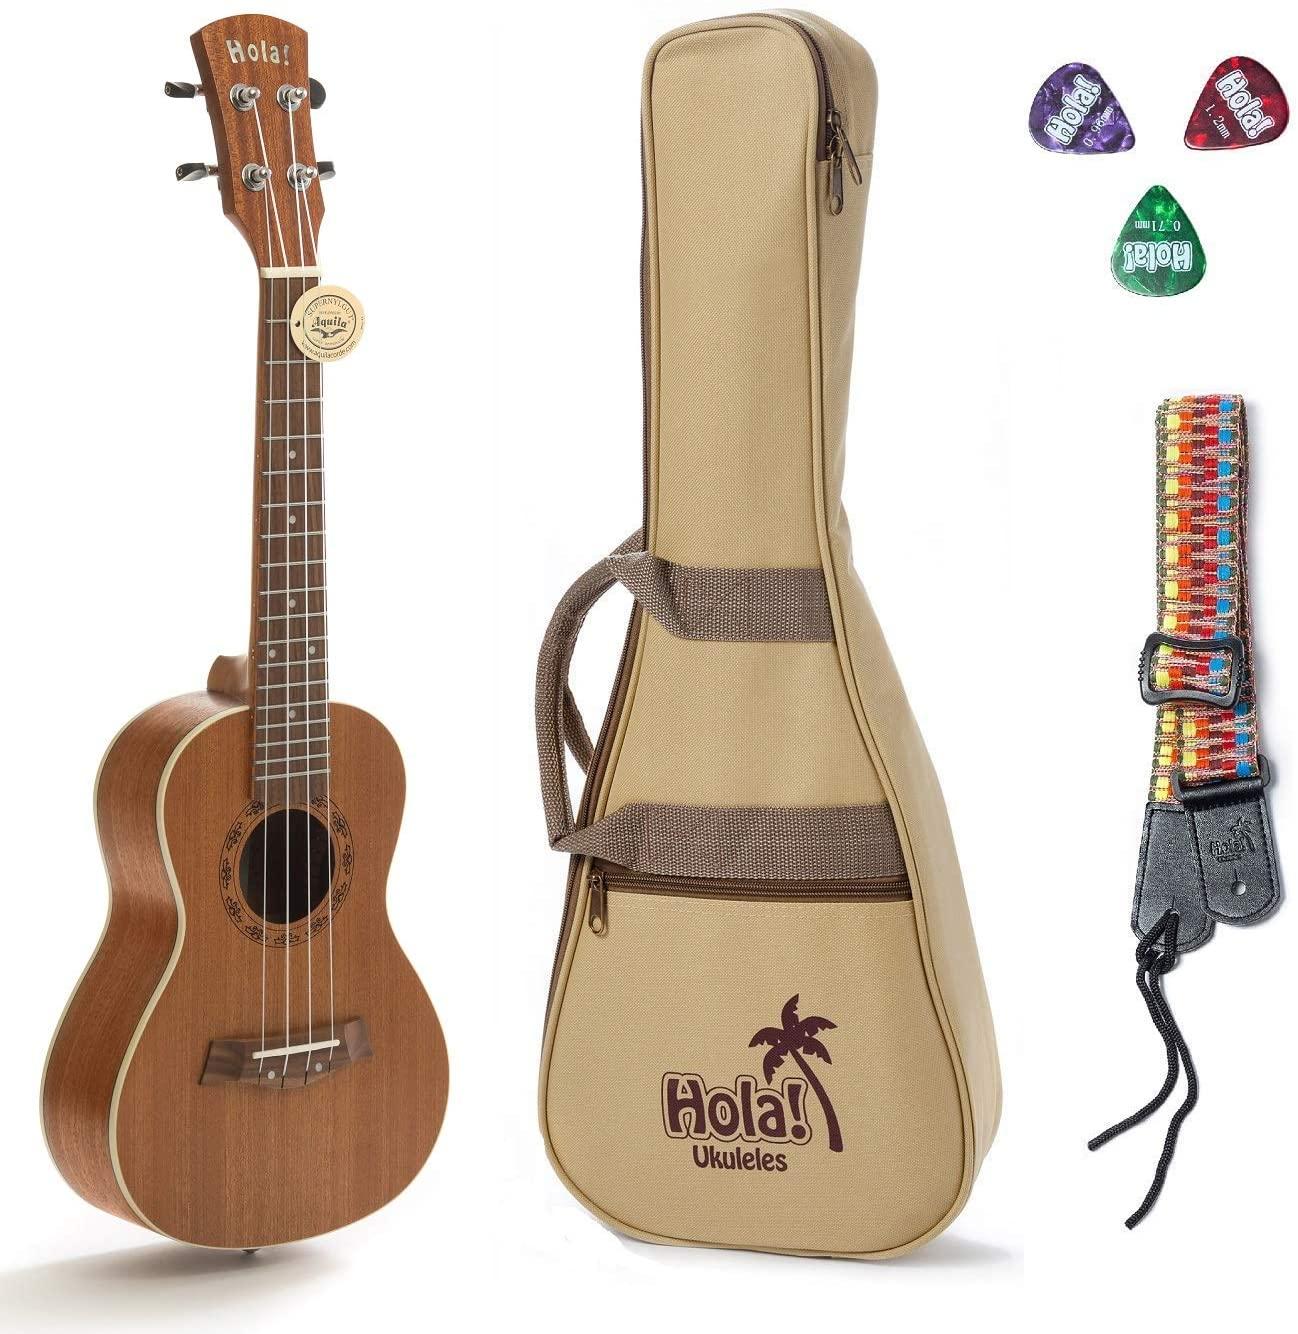 Concert Ukulele Bundle, Deluxe Series by Hola! Music (Model HM-124MG+), Bundle Includes: 24 Inch Mahogany Ukulele with Aquila Nylgut Strings Installed, Padded Gig Bag, Strap and Picks